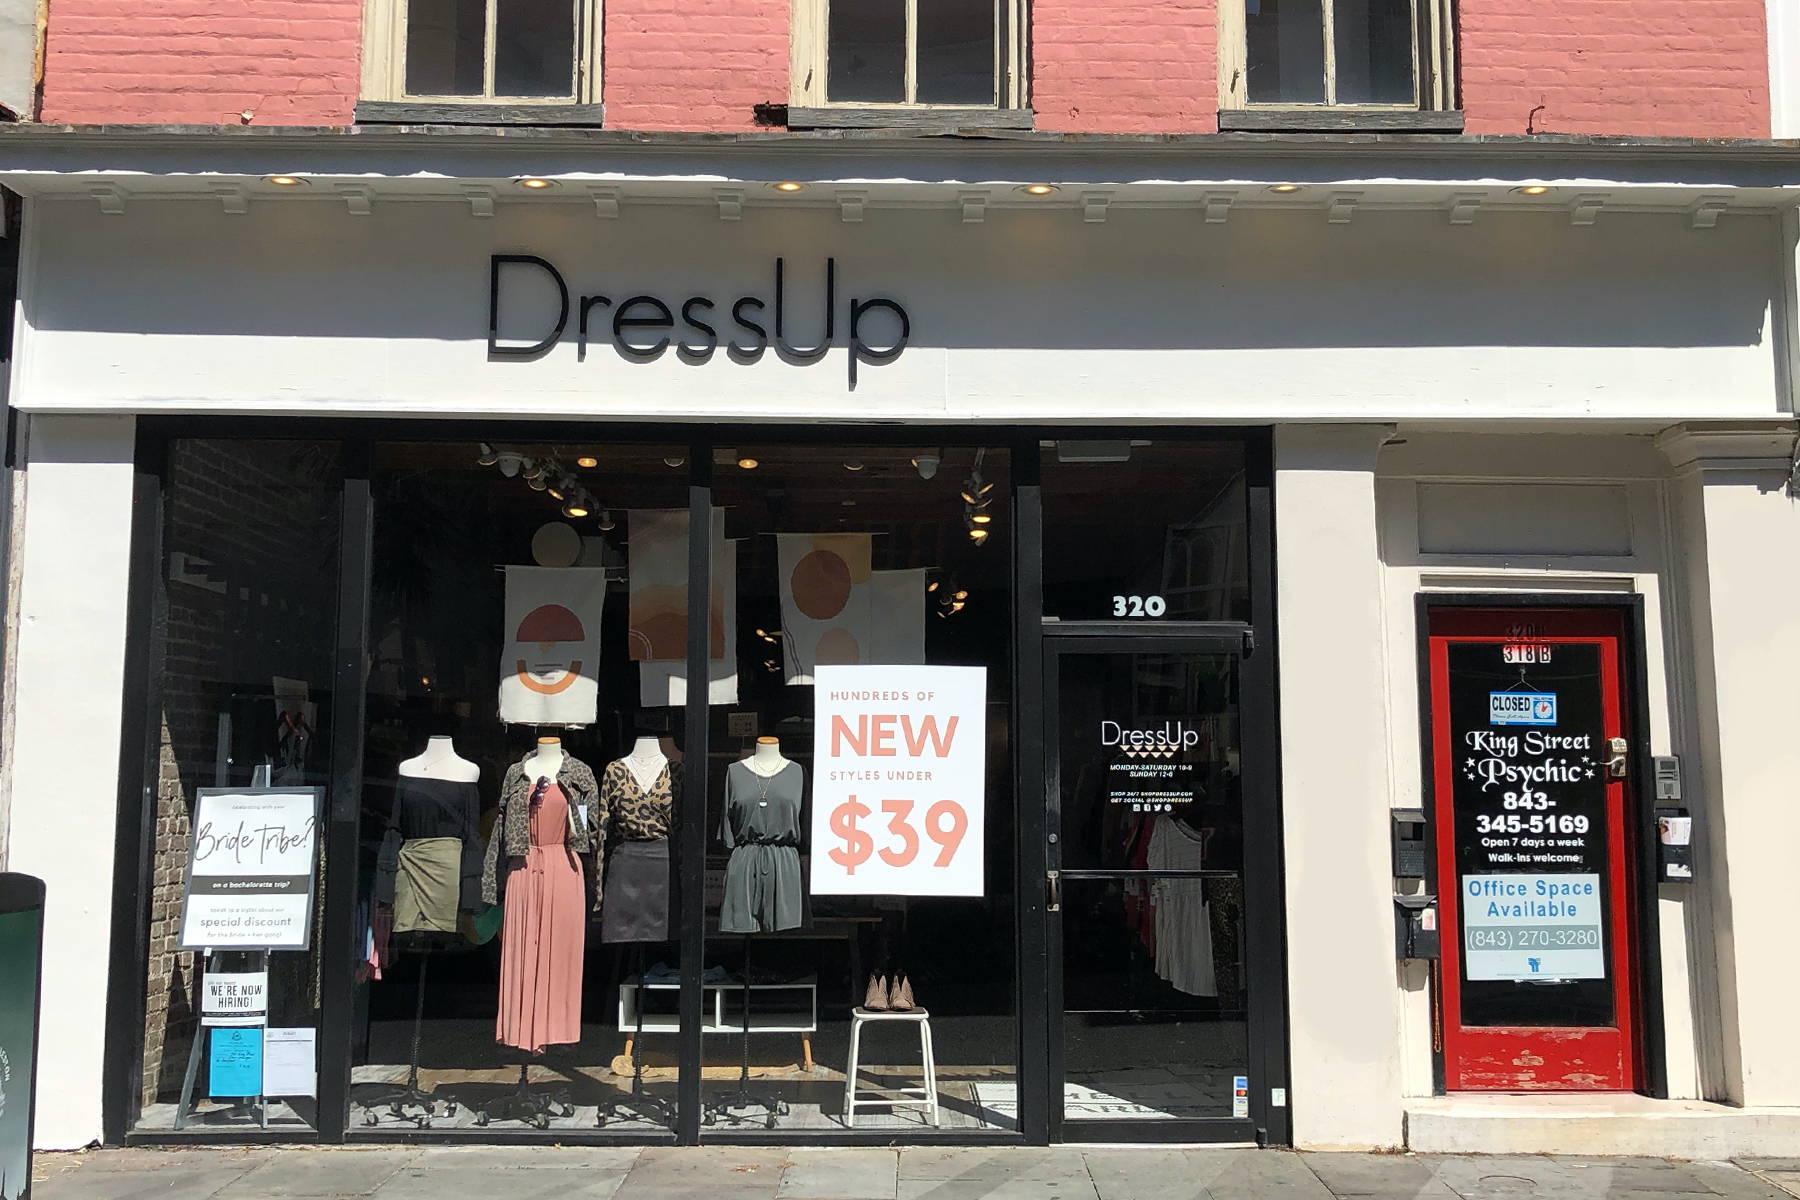 Dress Up Charleston storefront